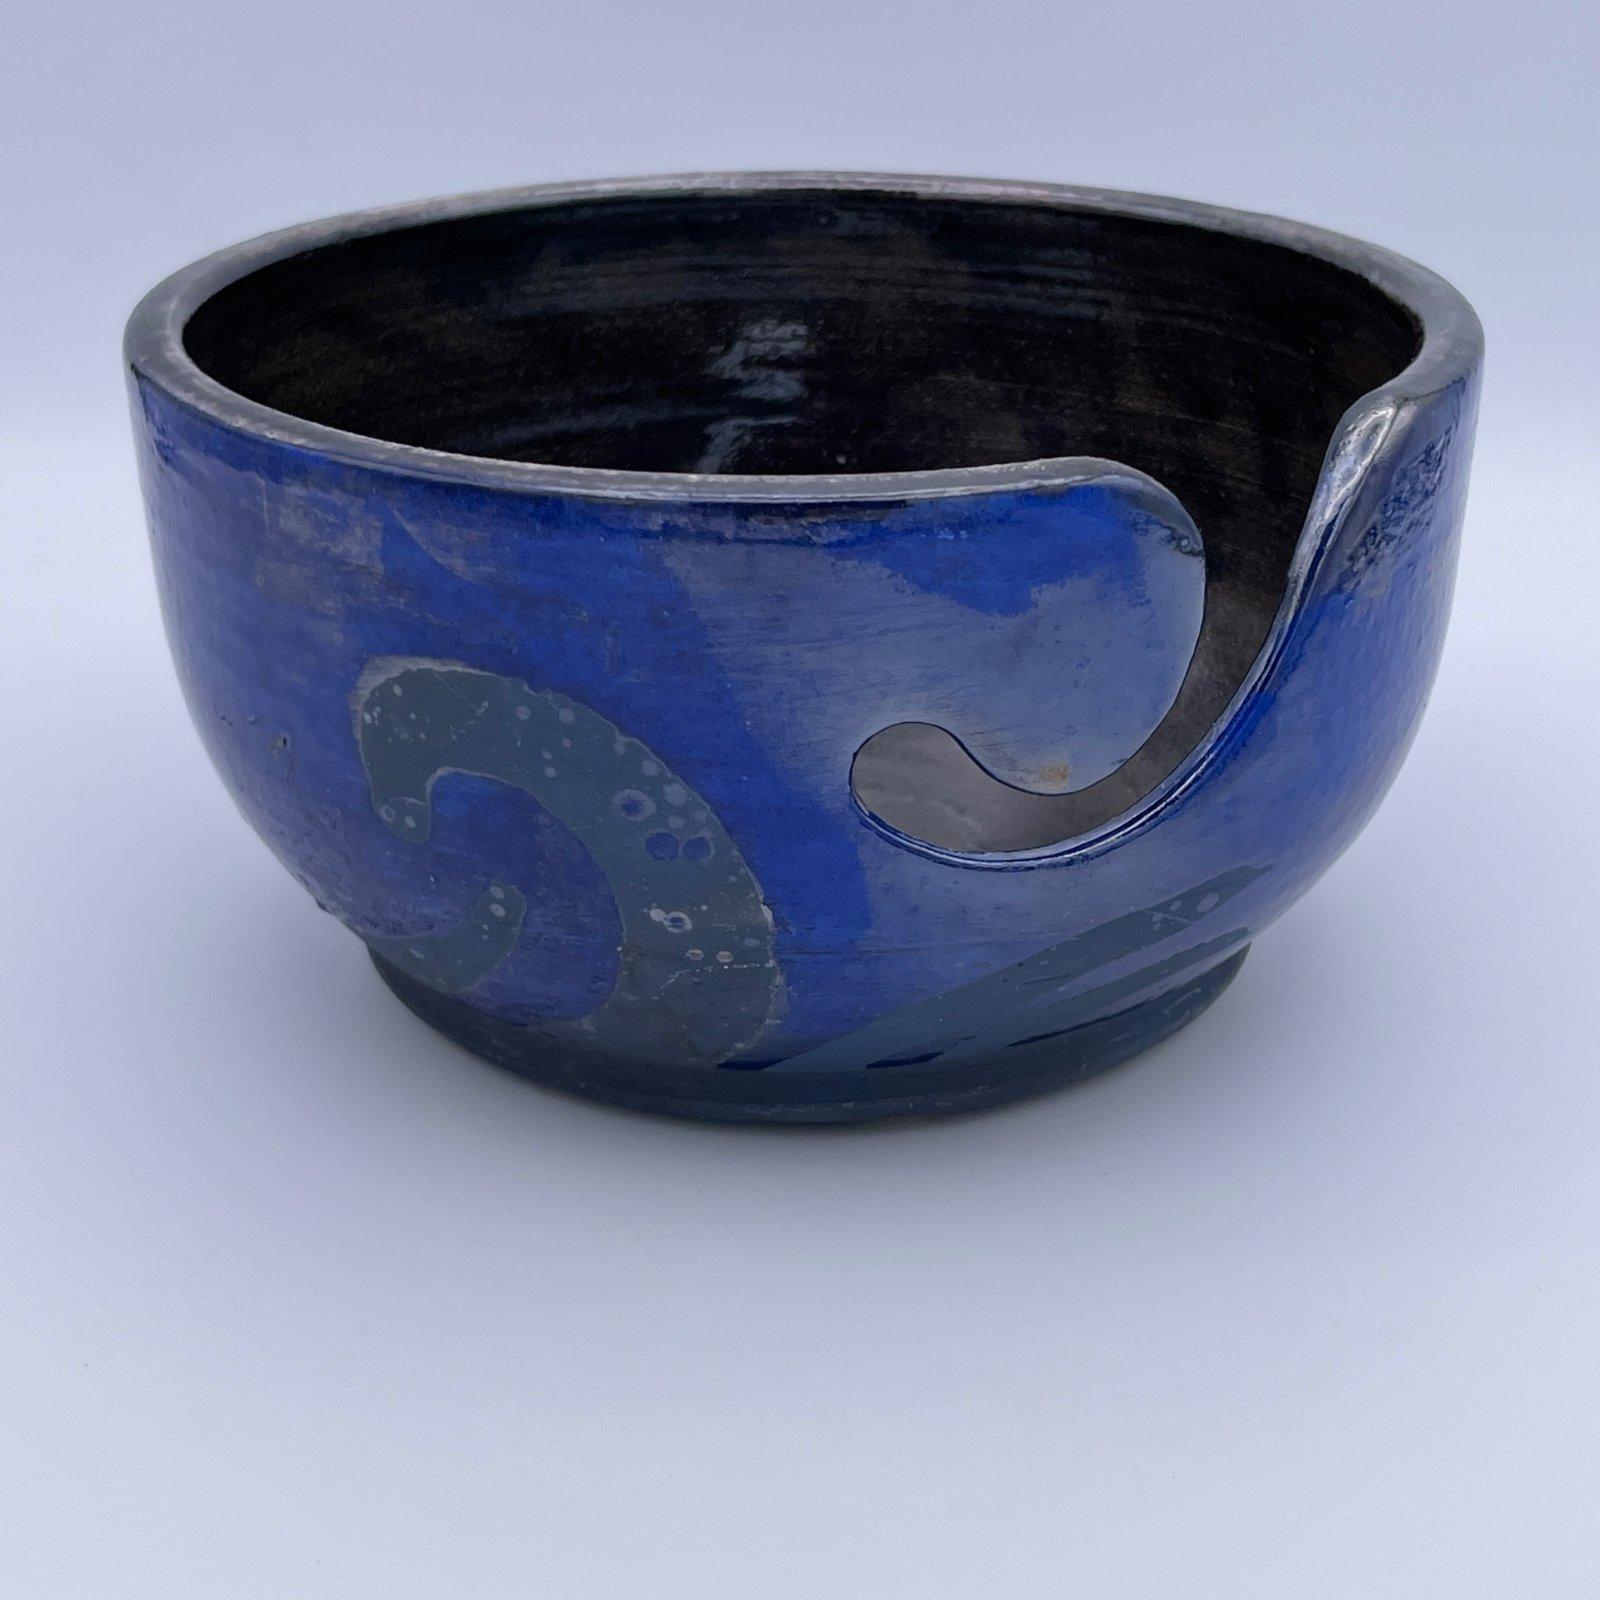 LickinFlames - Handcrafted Yarn Bowl - Medium